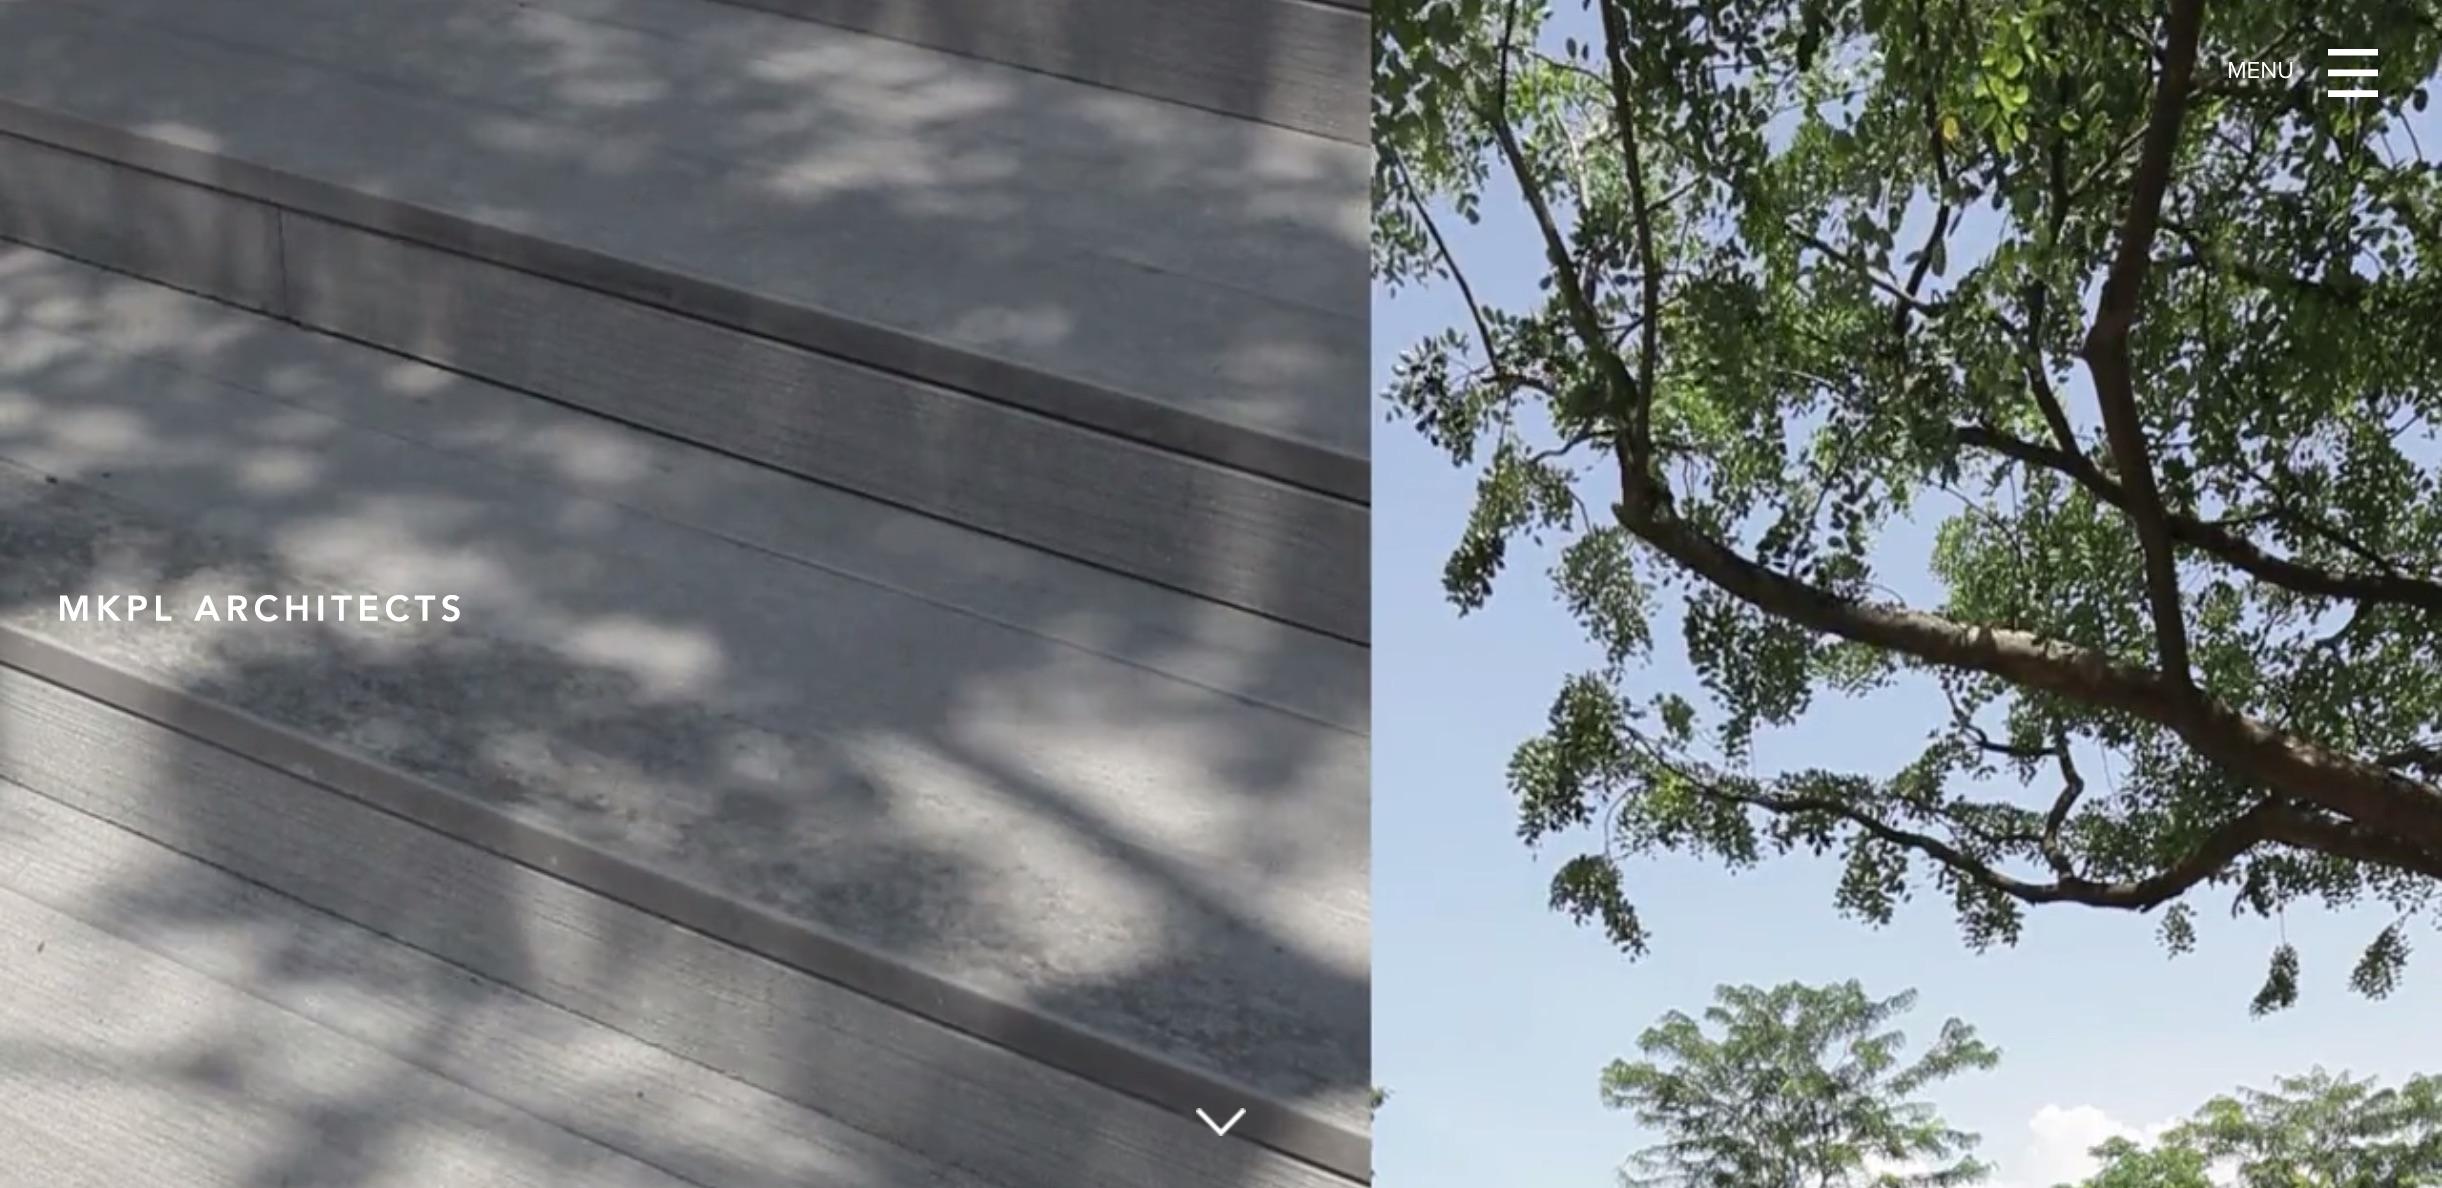 Architectural Firm Designs